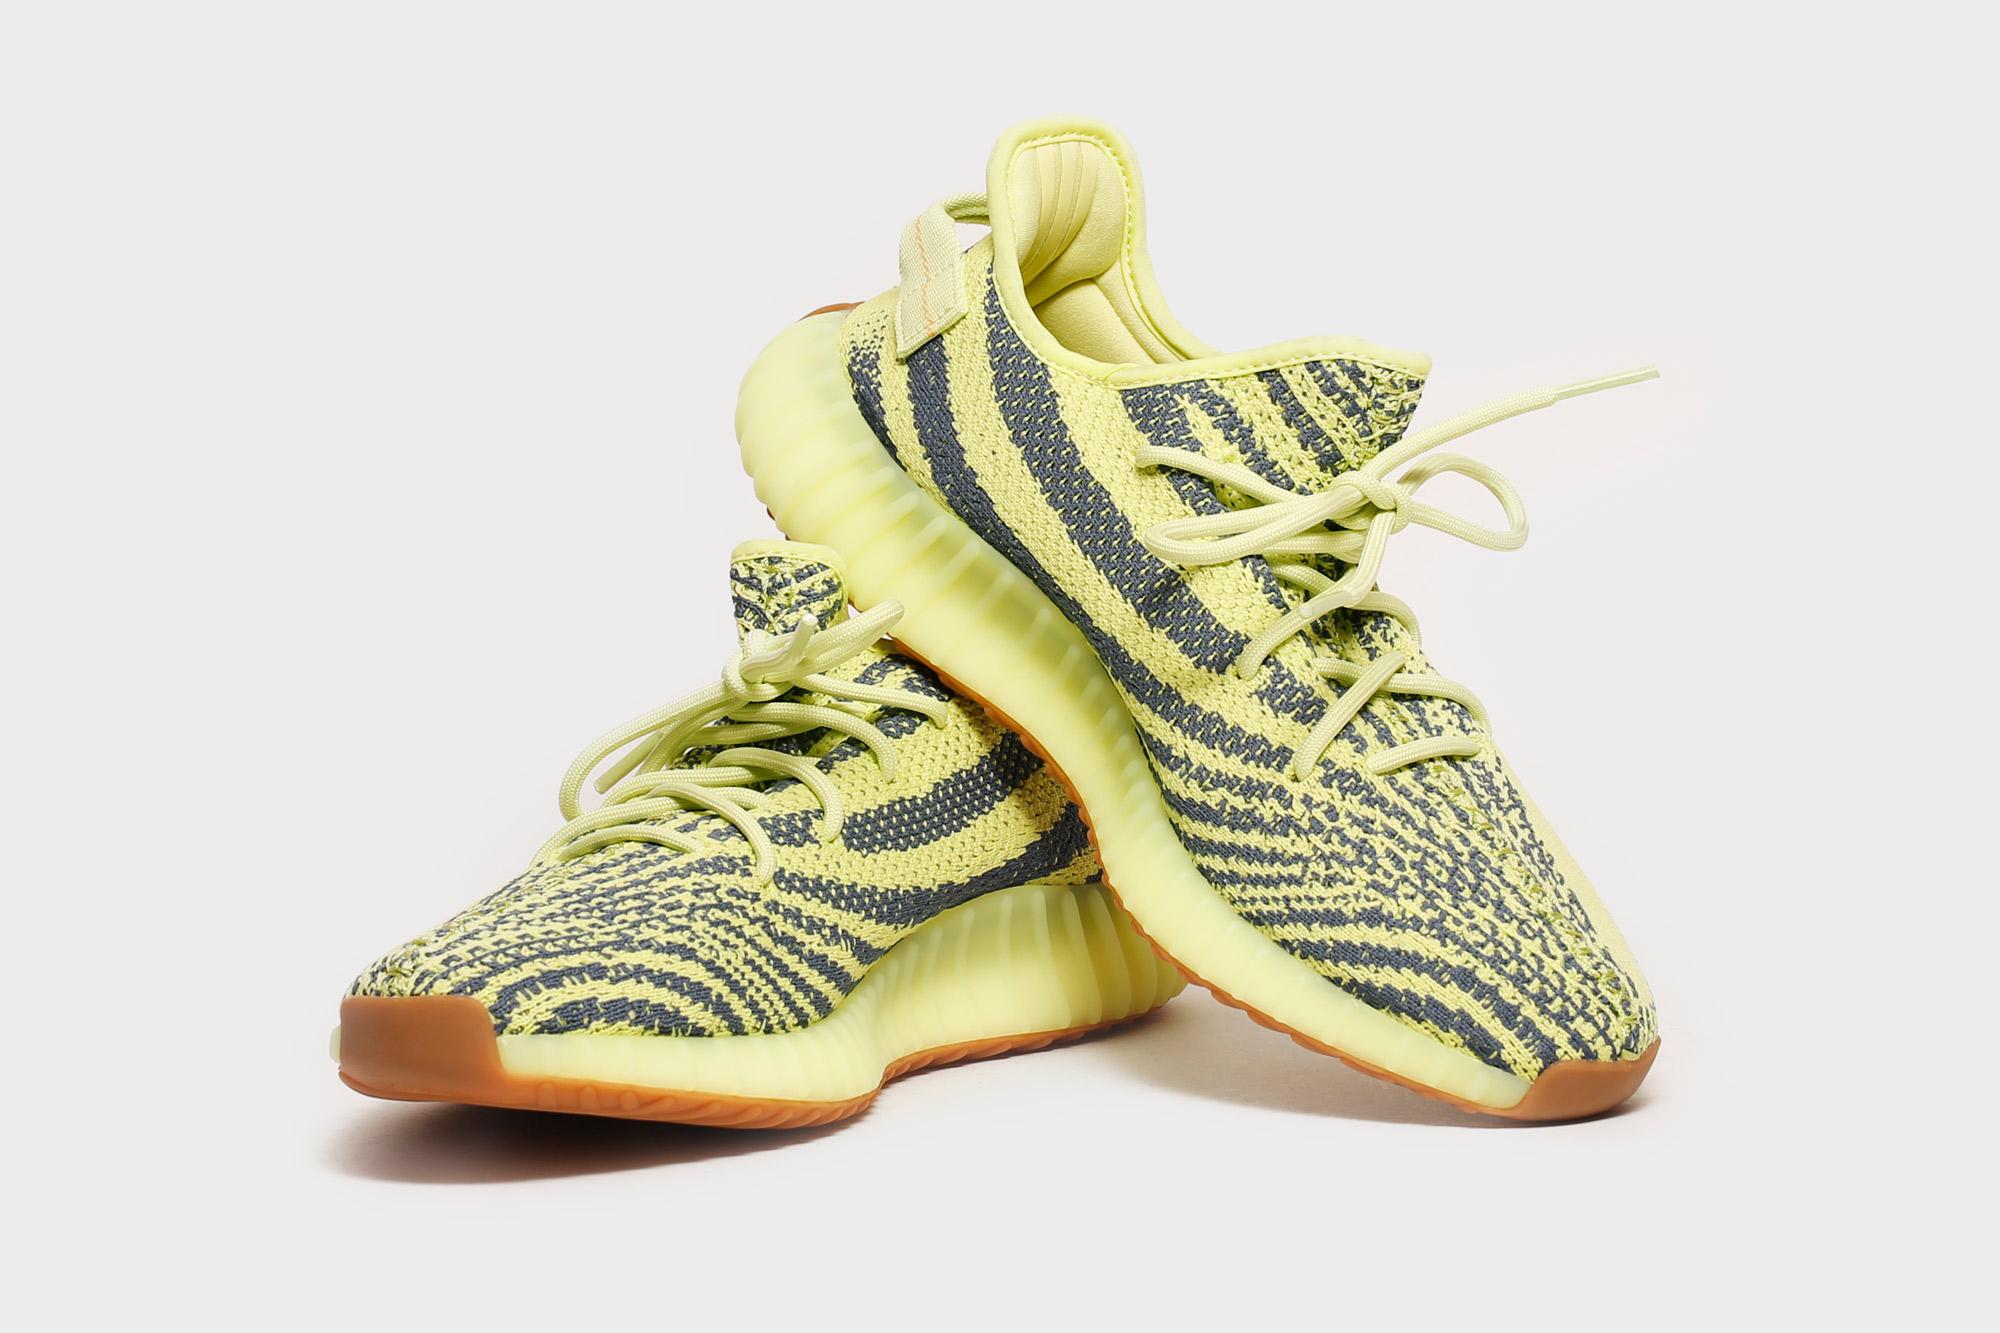 adidas yeezy boost 350 v2 semi frozen yellow online raffle